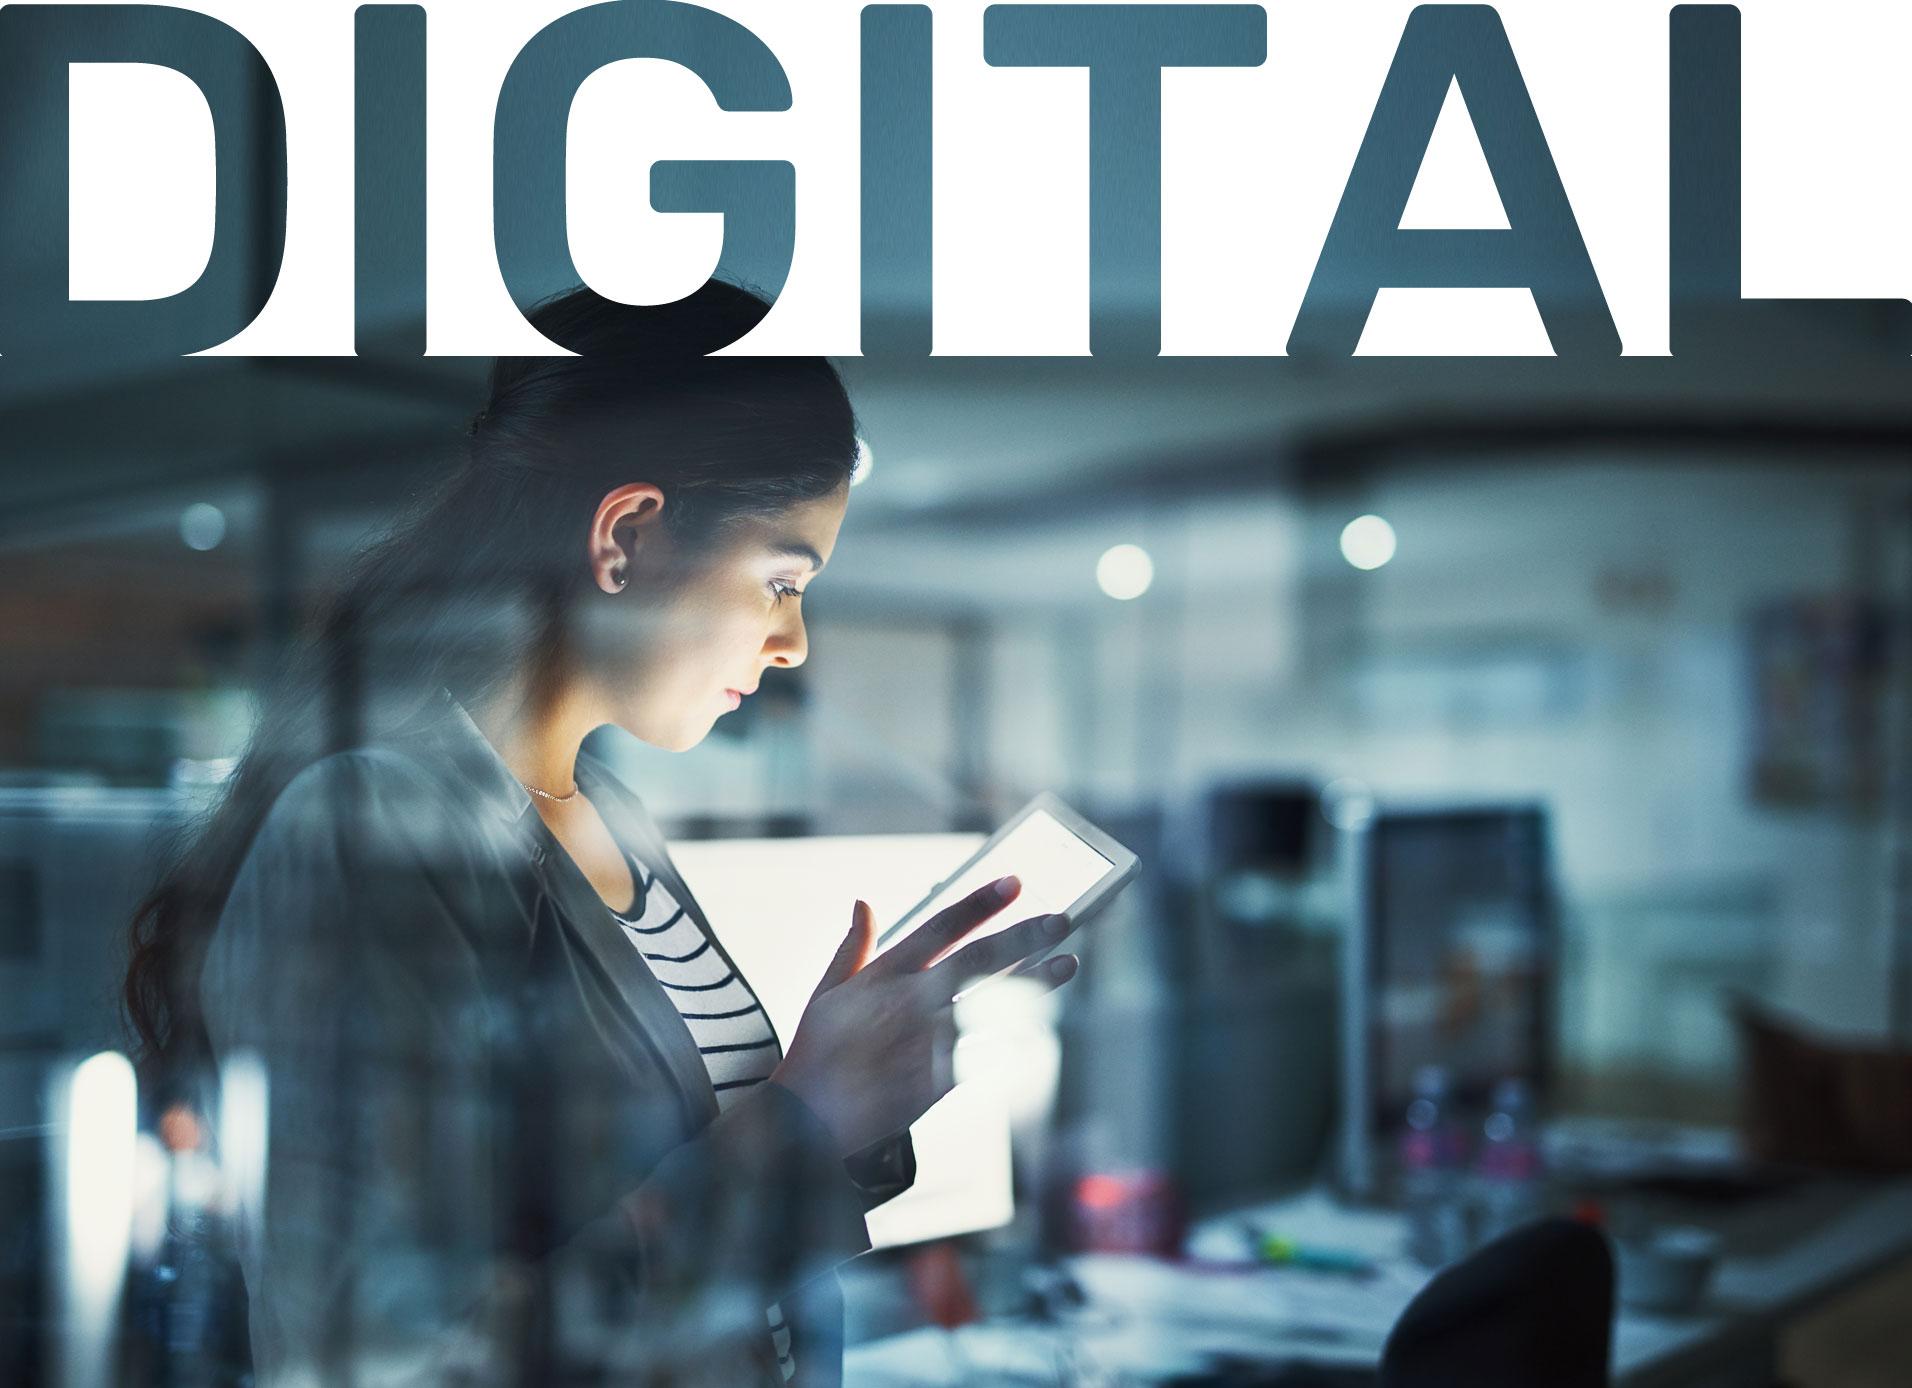 J. Gottheil Marketing Digital